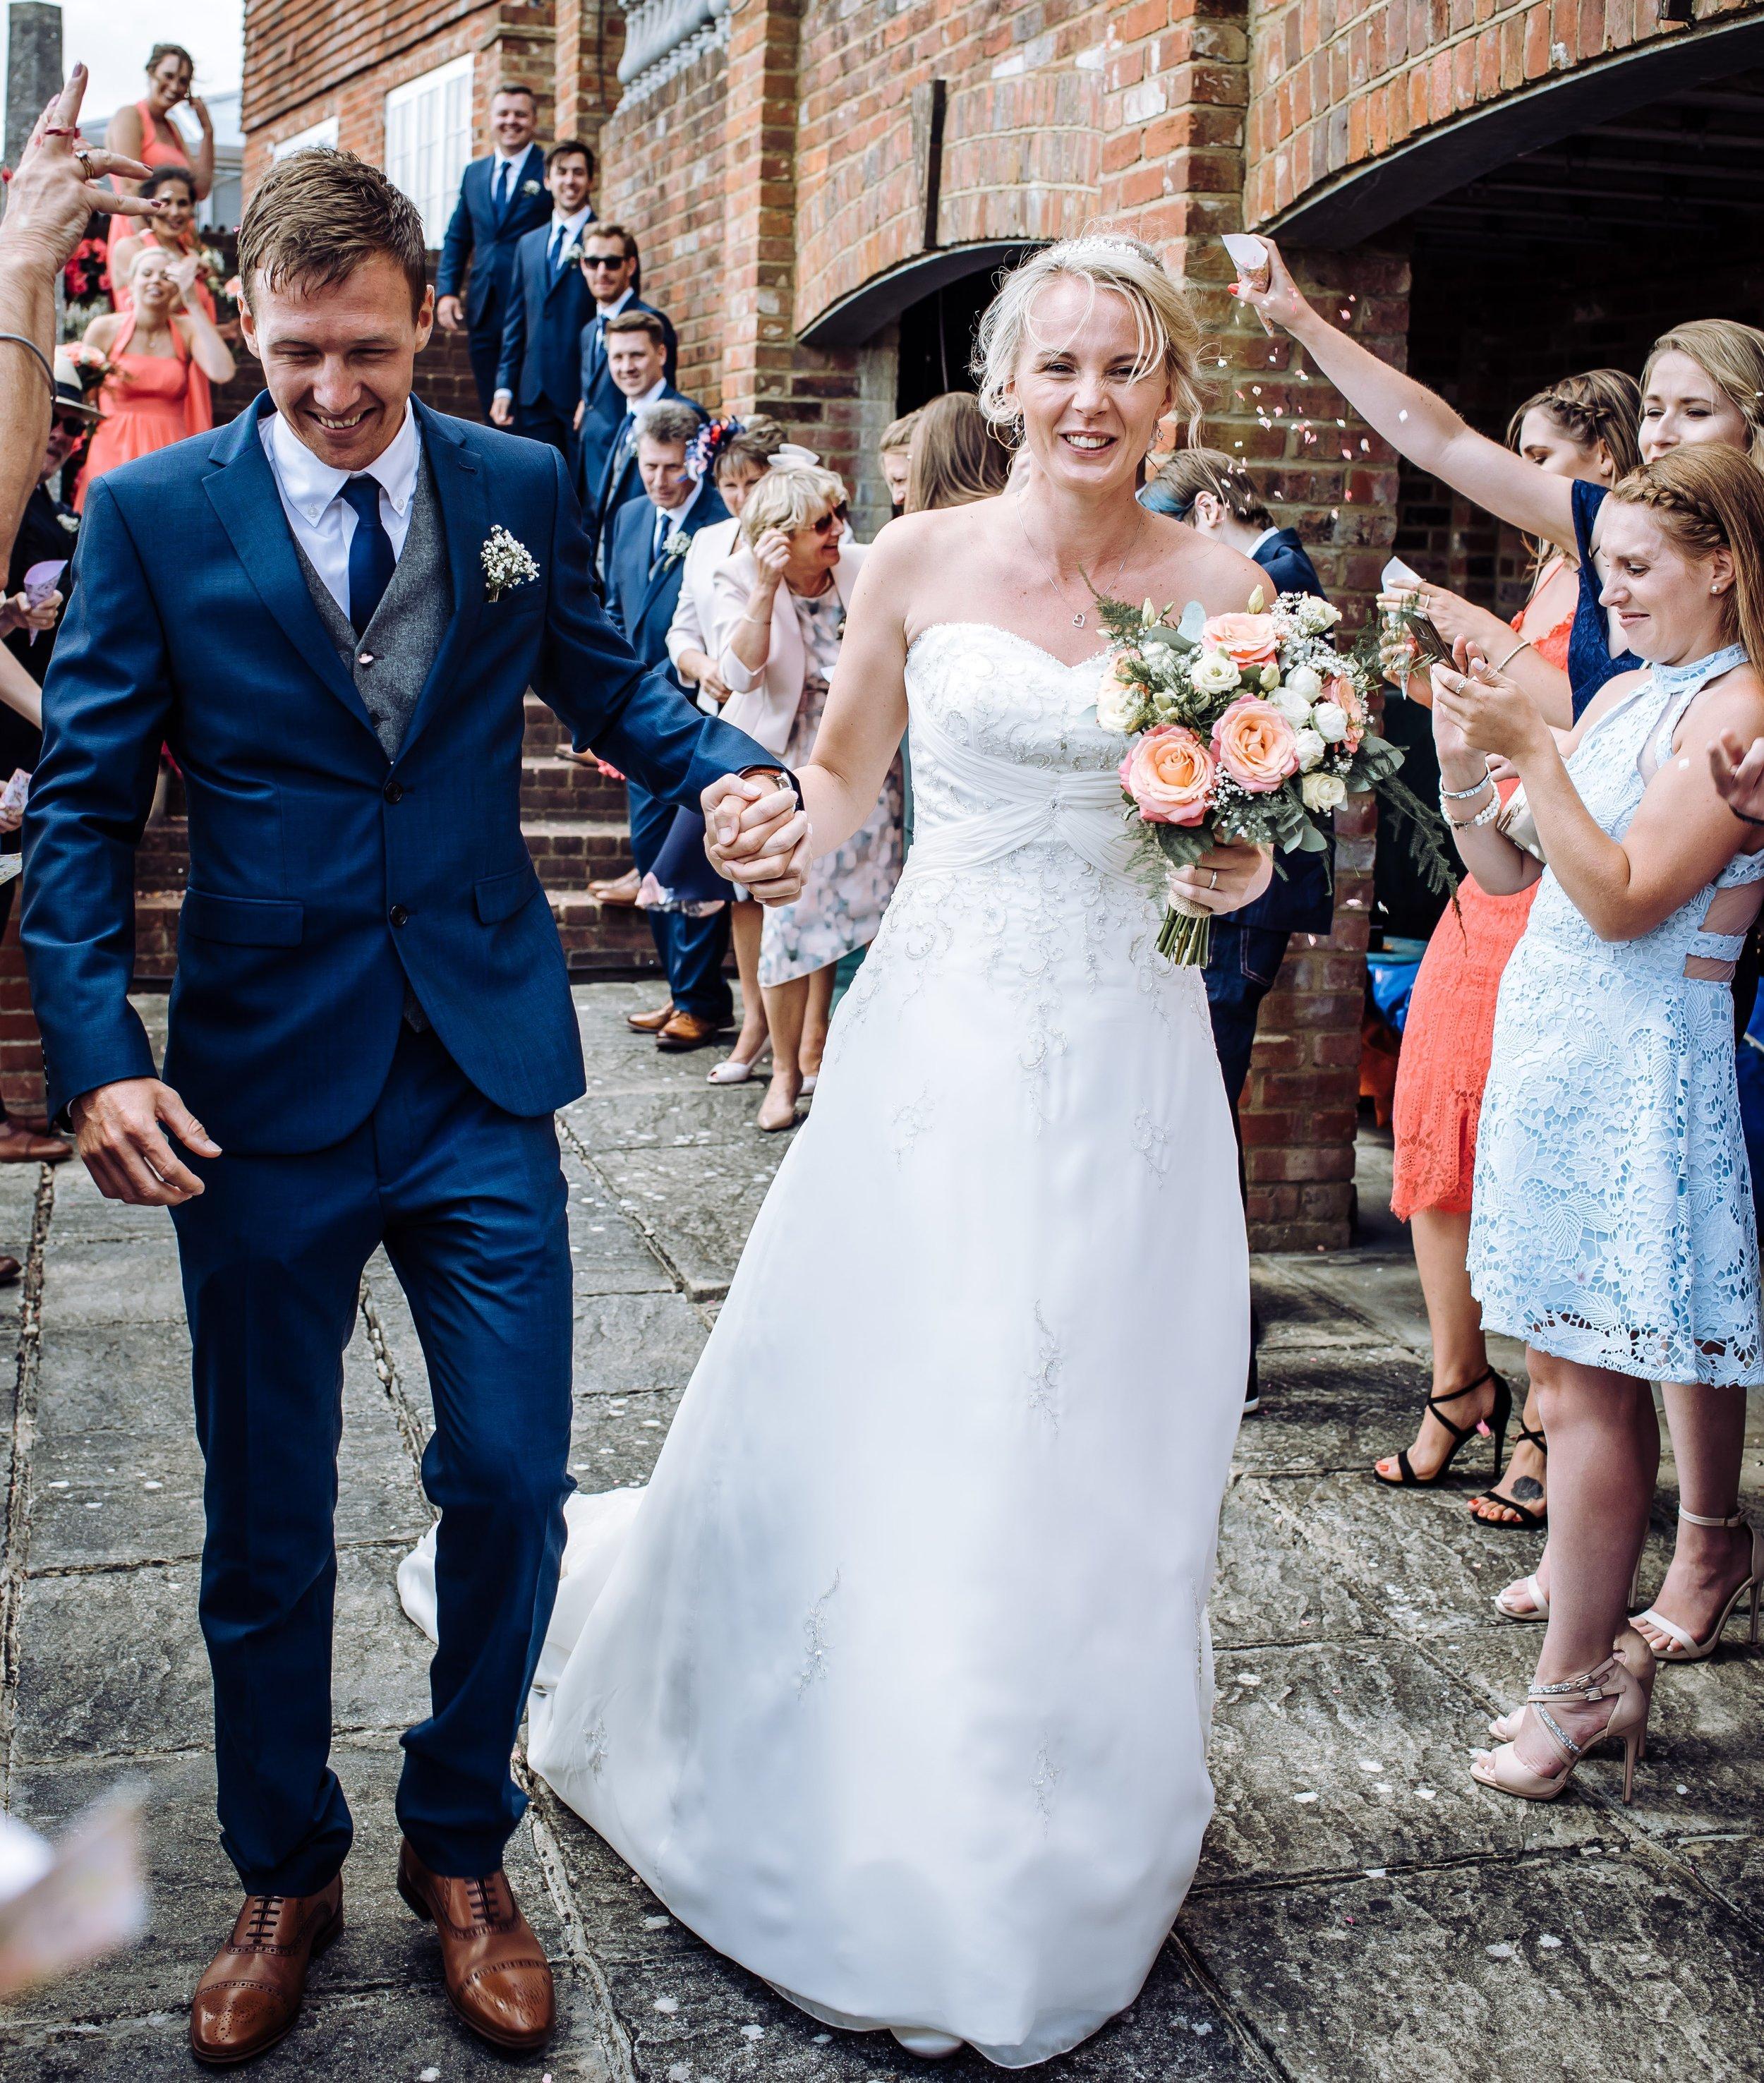 Vintage Wedding - East Sussex Wedding Photographer_0143.jpg